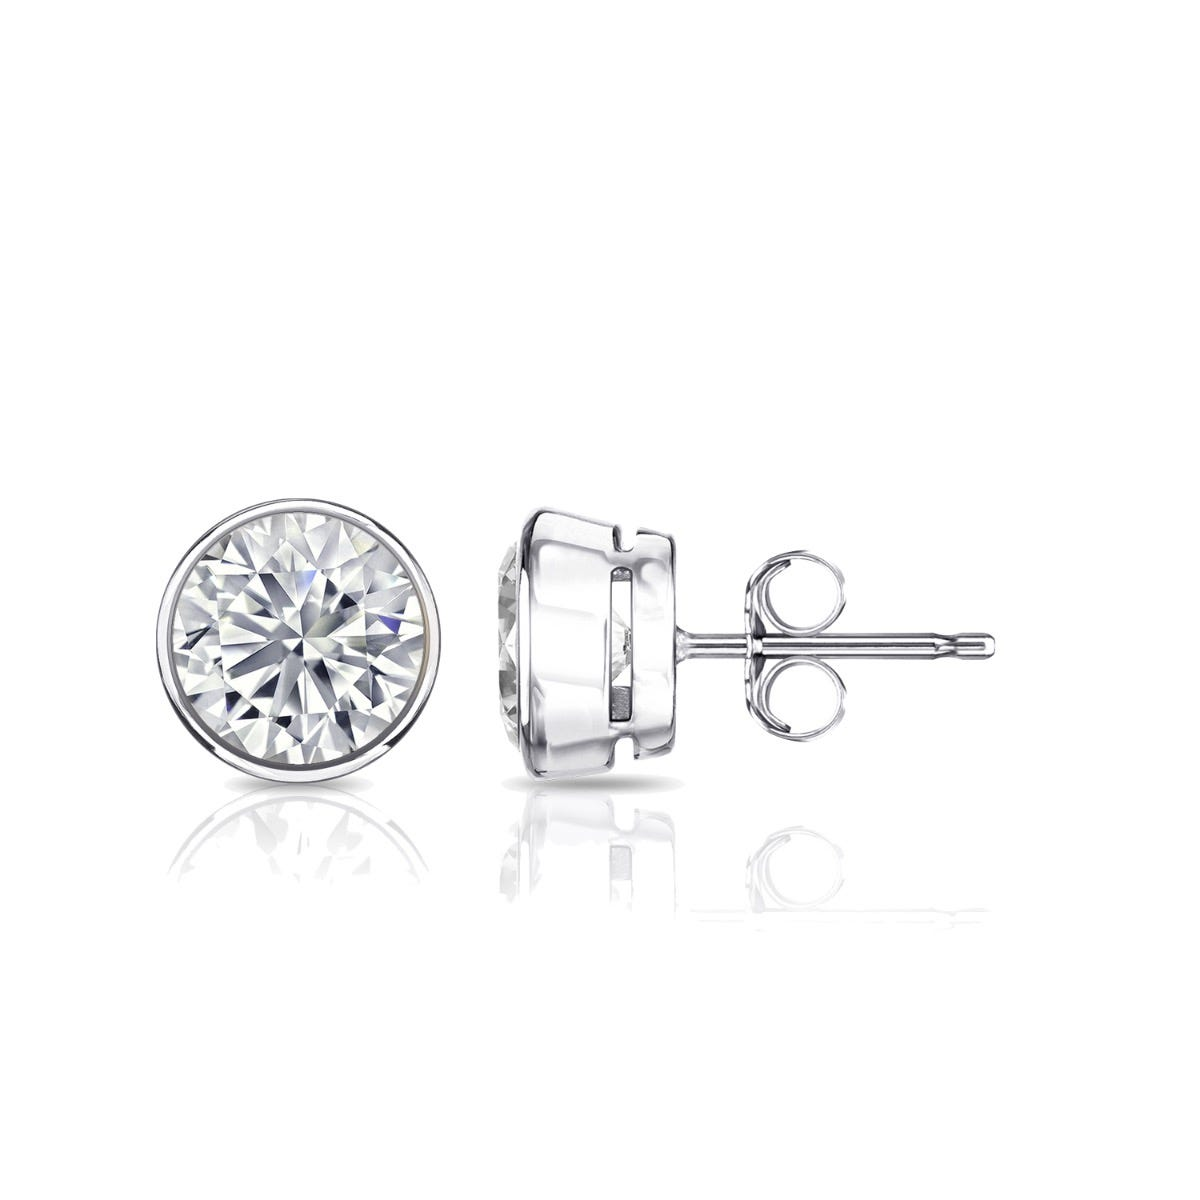 Diamond Round Bezel-Set 1ctw. Solitaire Stud (IJ-SI1) Earrings in 14K White Gold